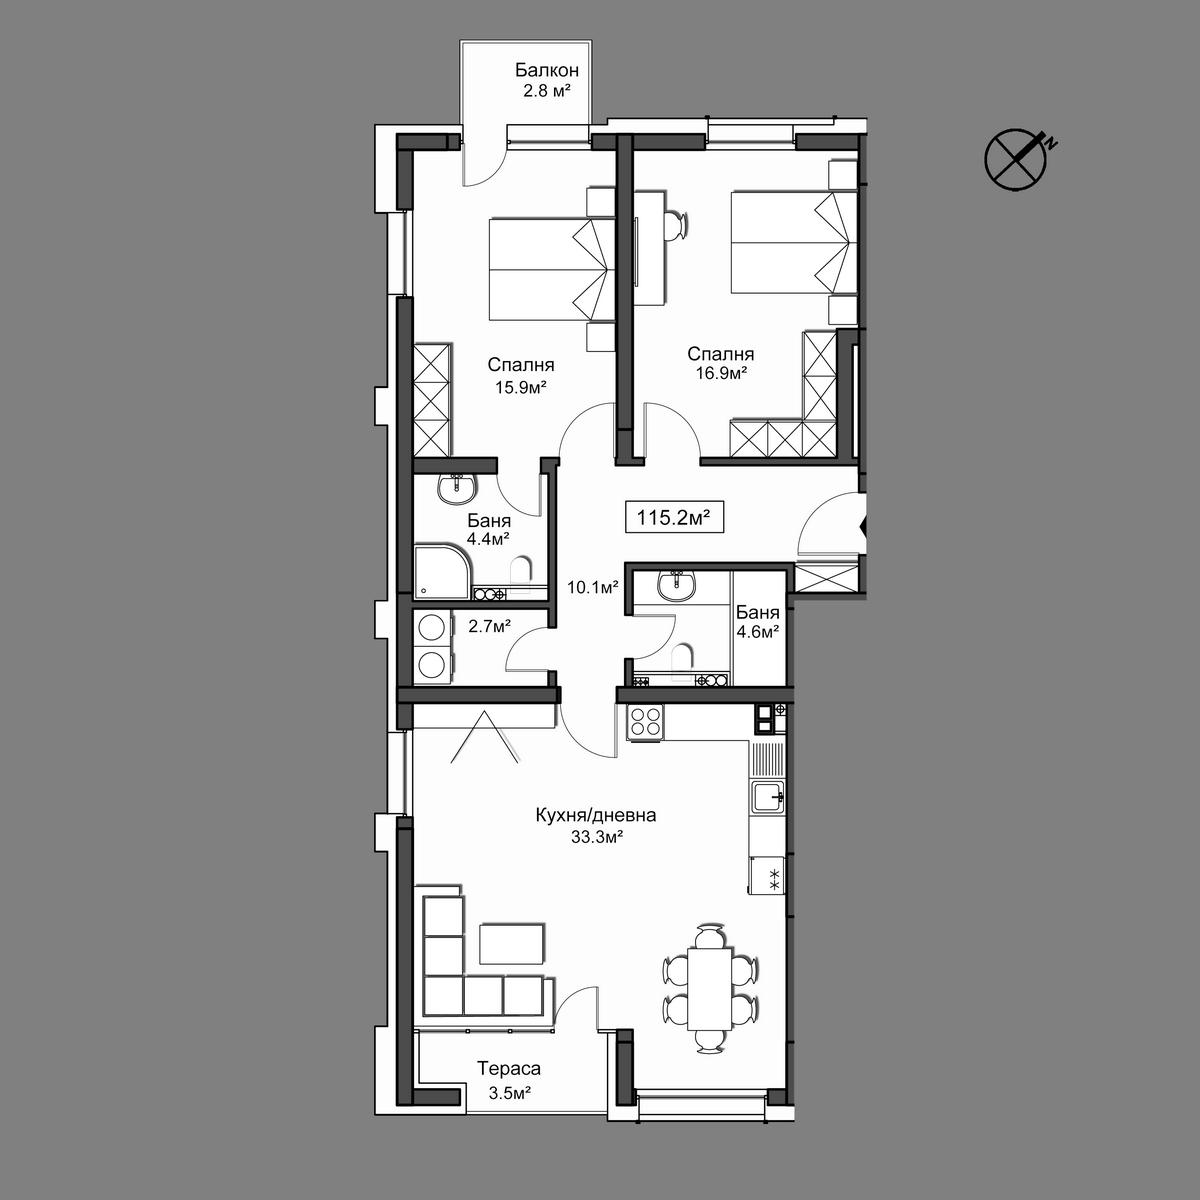 Продава апартамент ново строителство - Апартамент 22